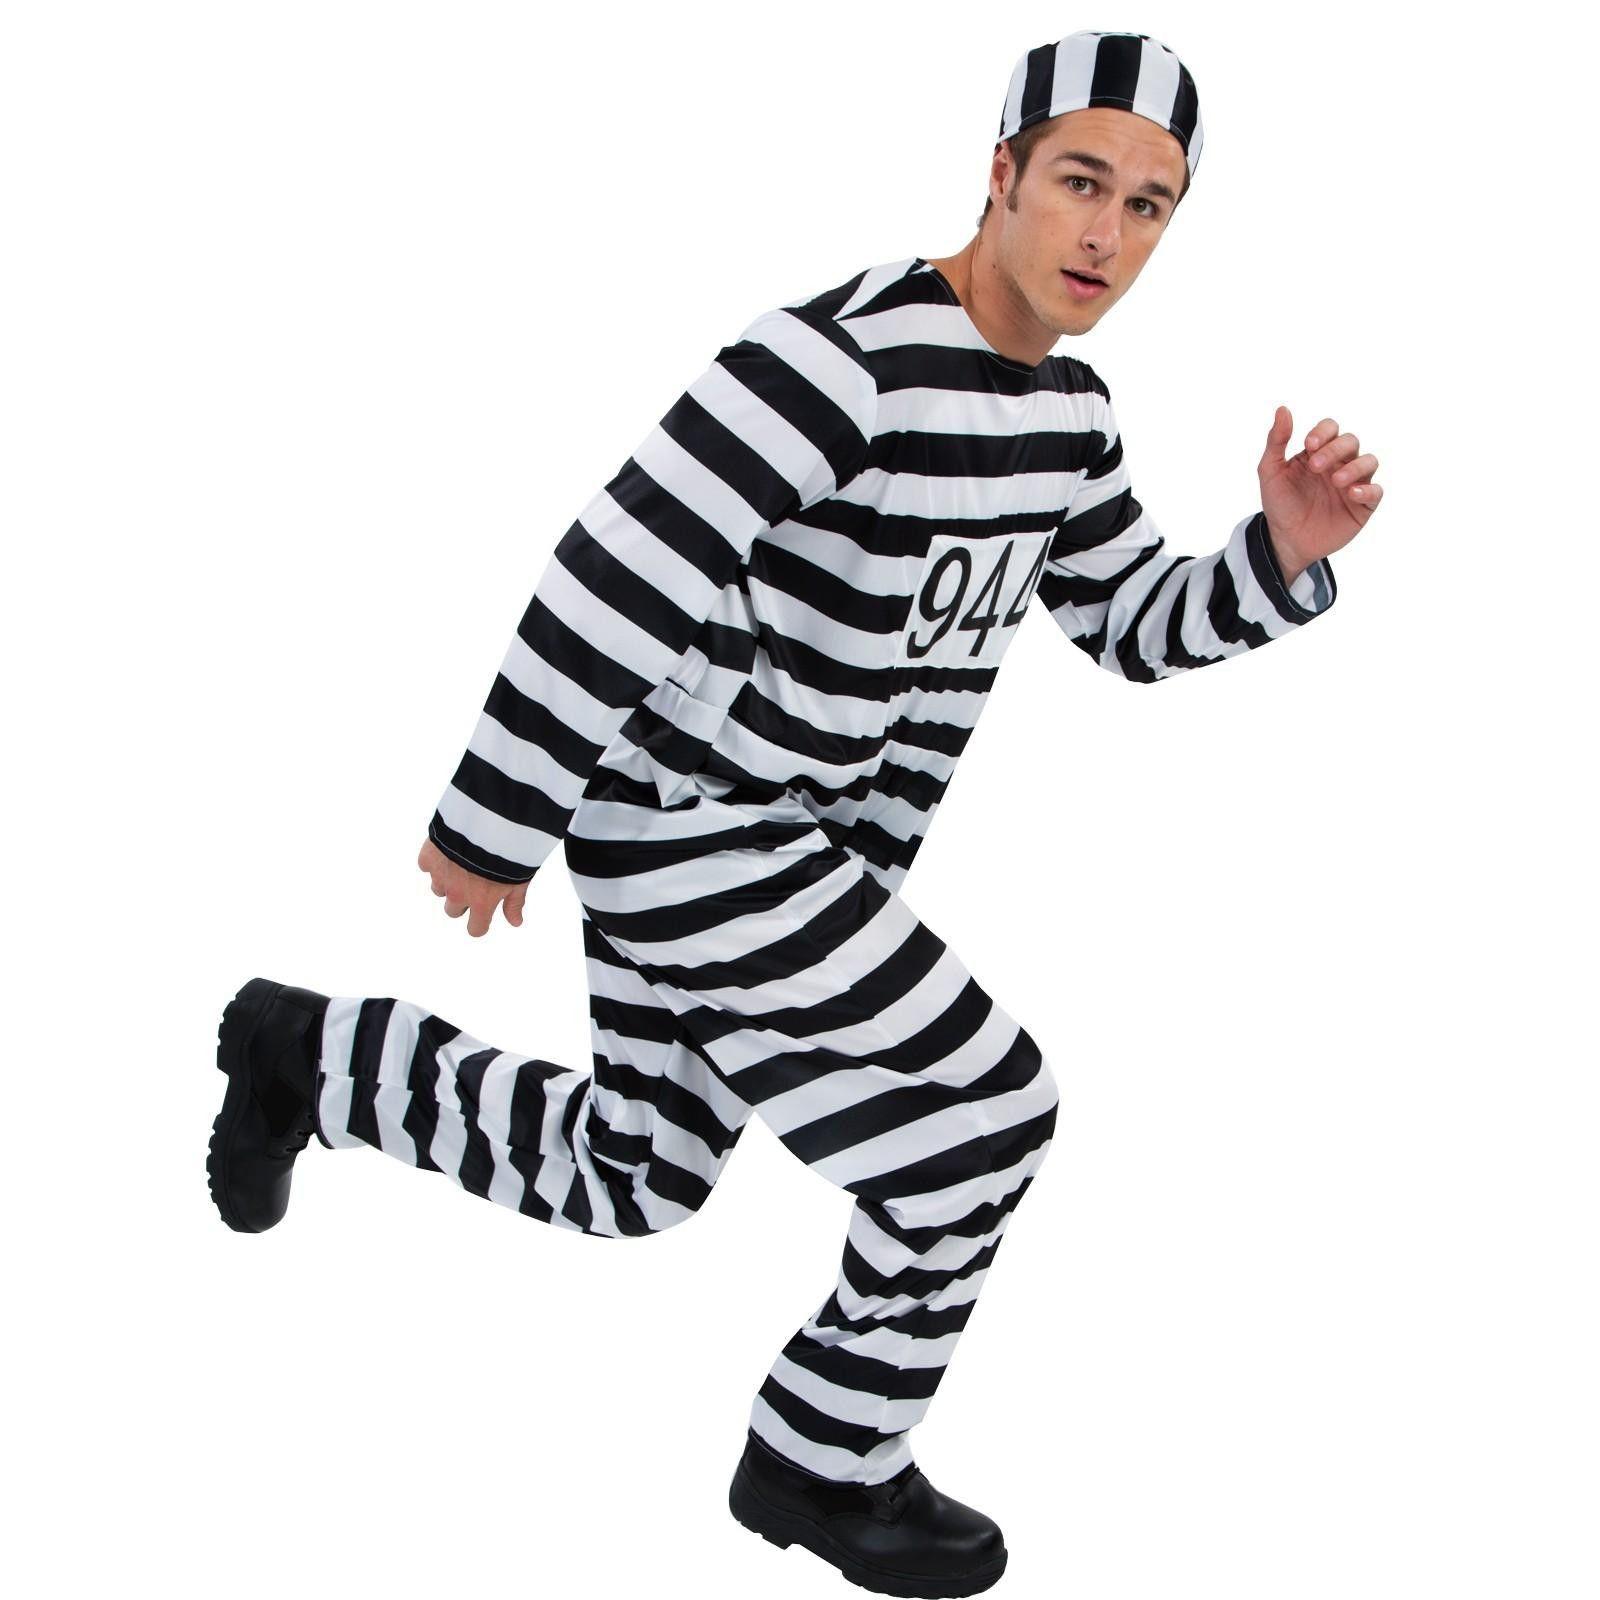 Adult Convict Costume  sc 1 st  Pinterest & Adult Convict Costume | Crafts | Pinterest | Convict costume and ...